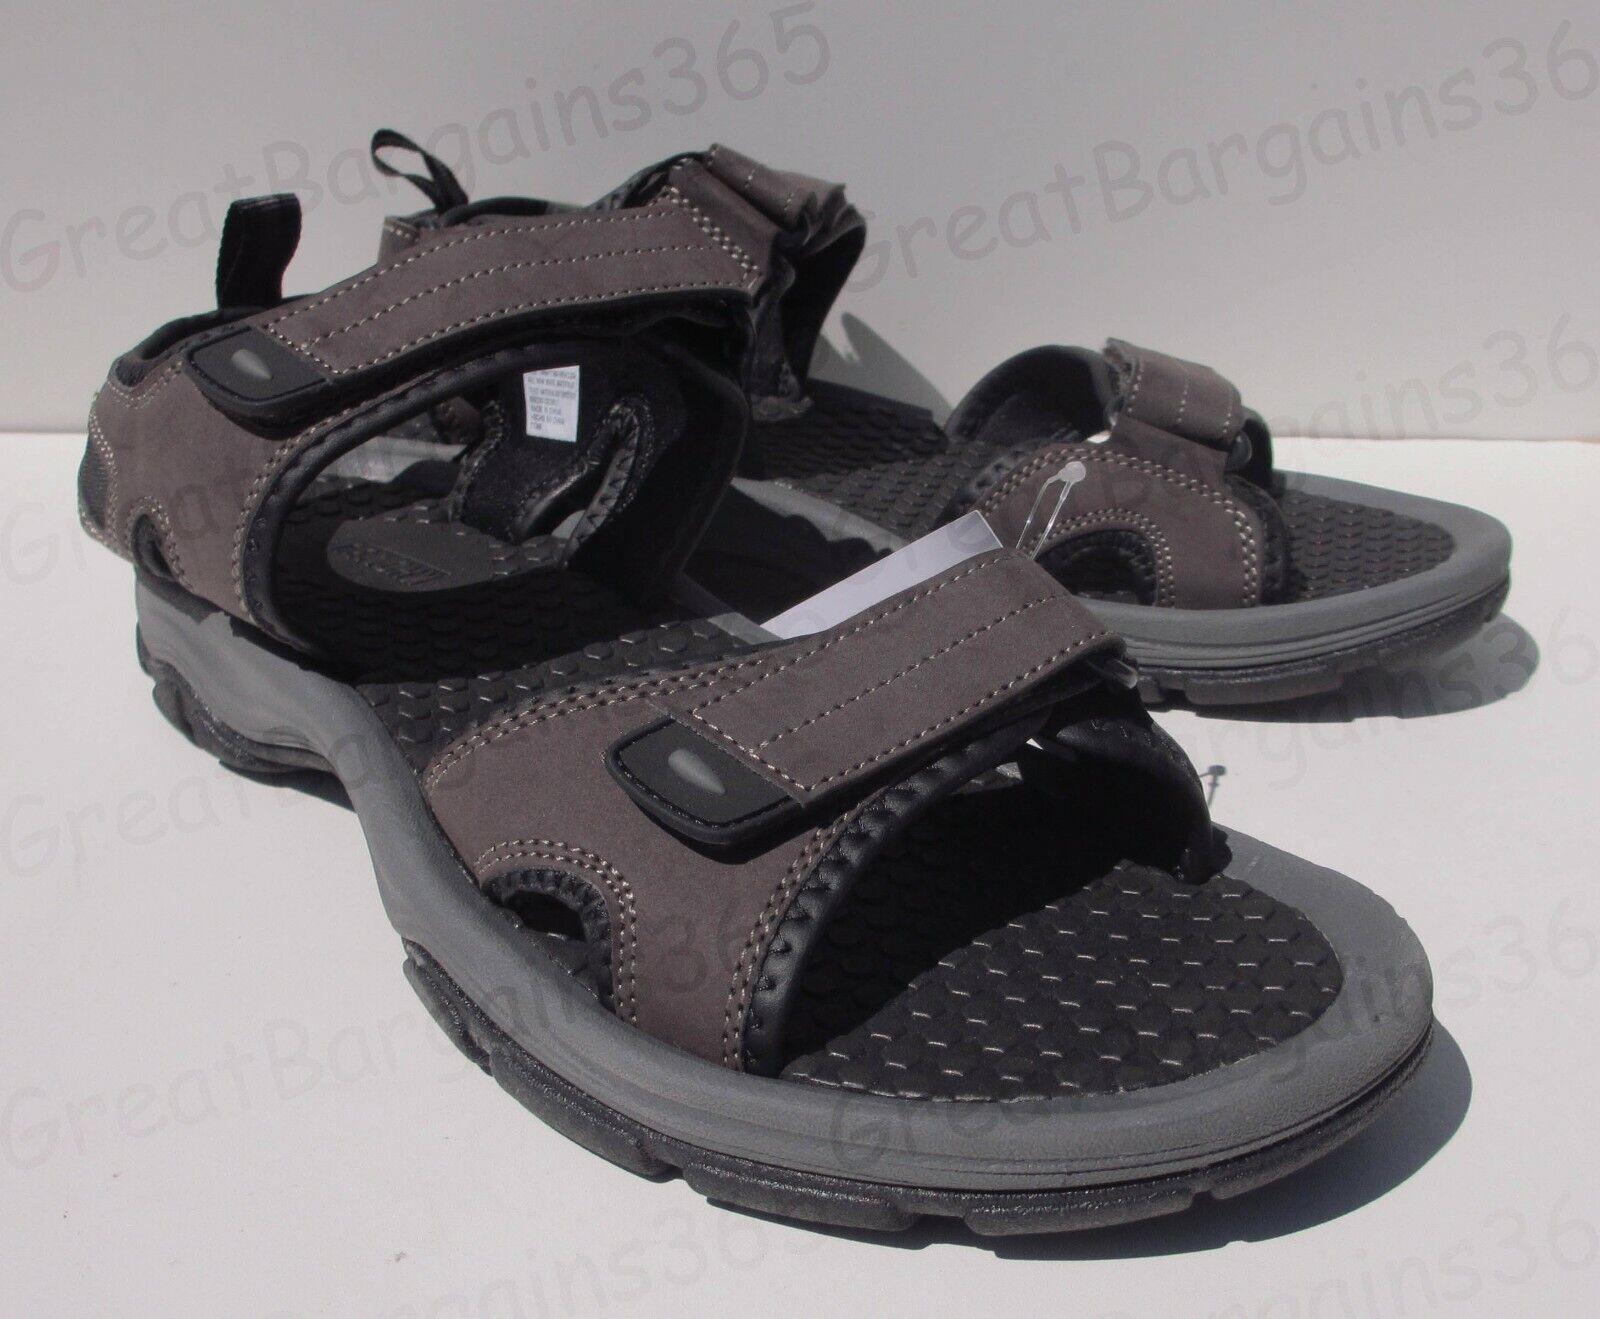 Men's UK 9 Khombu BARRACUDA River Comfort Sandals Footwear Beach Brown New*